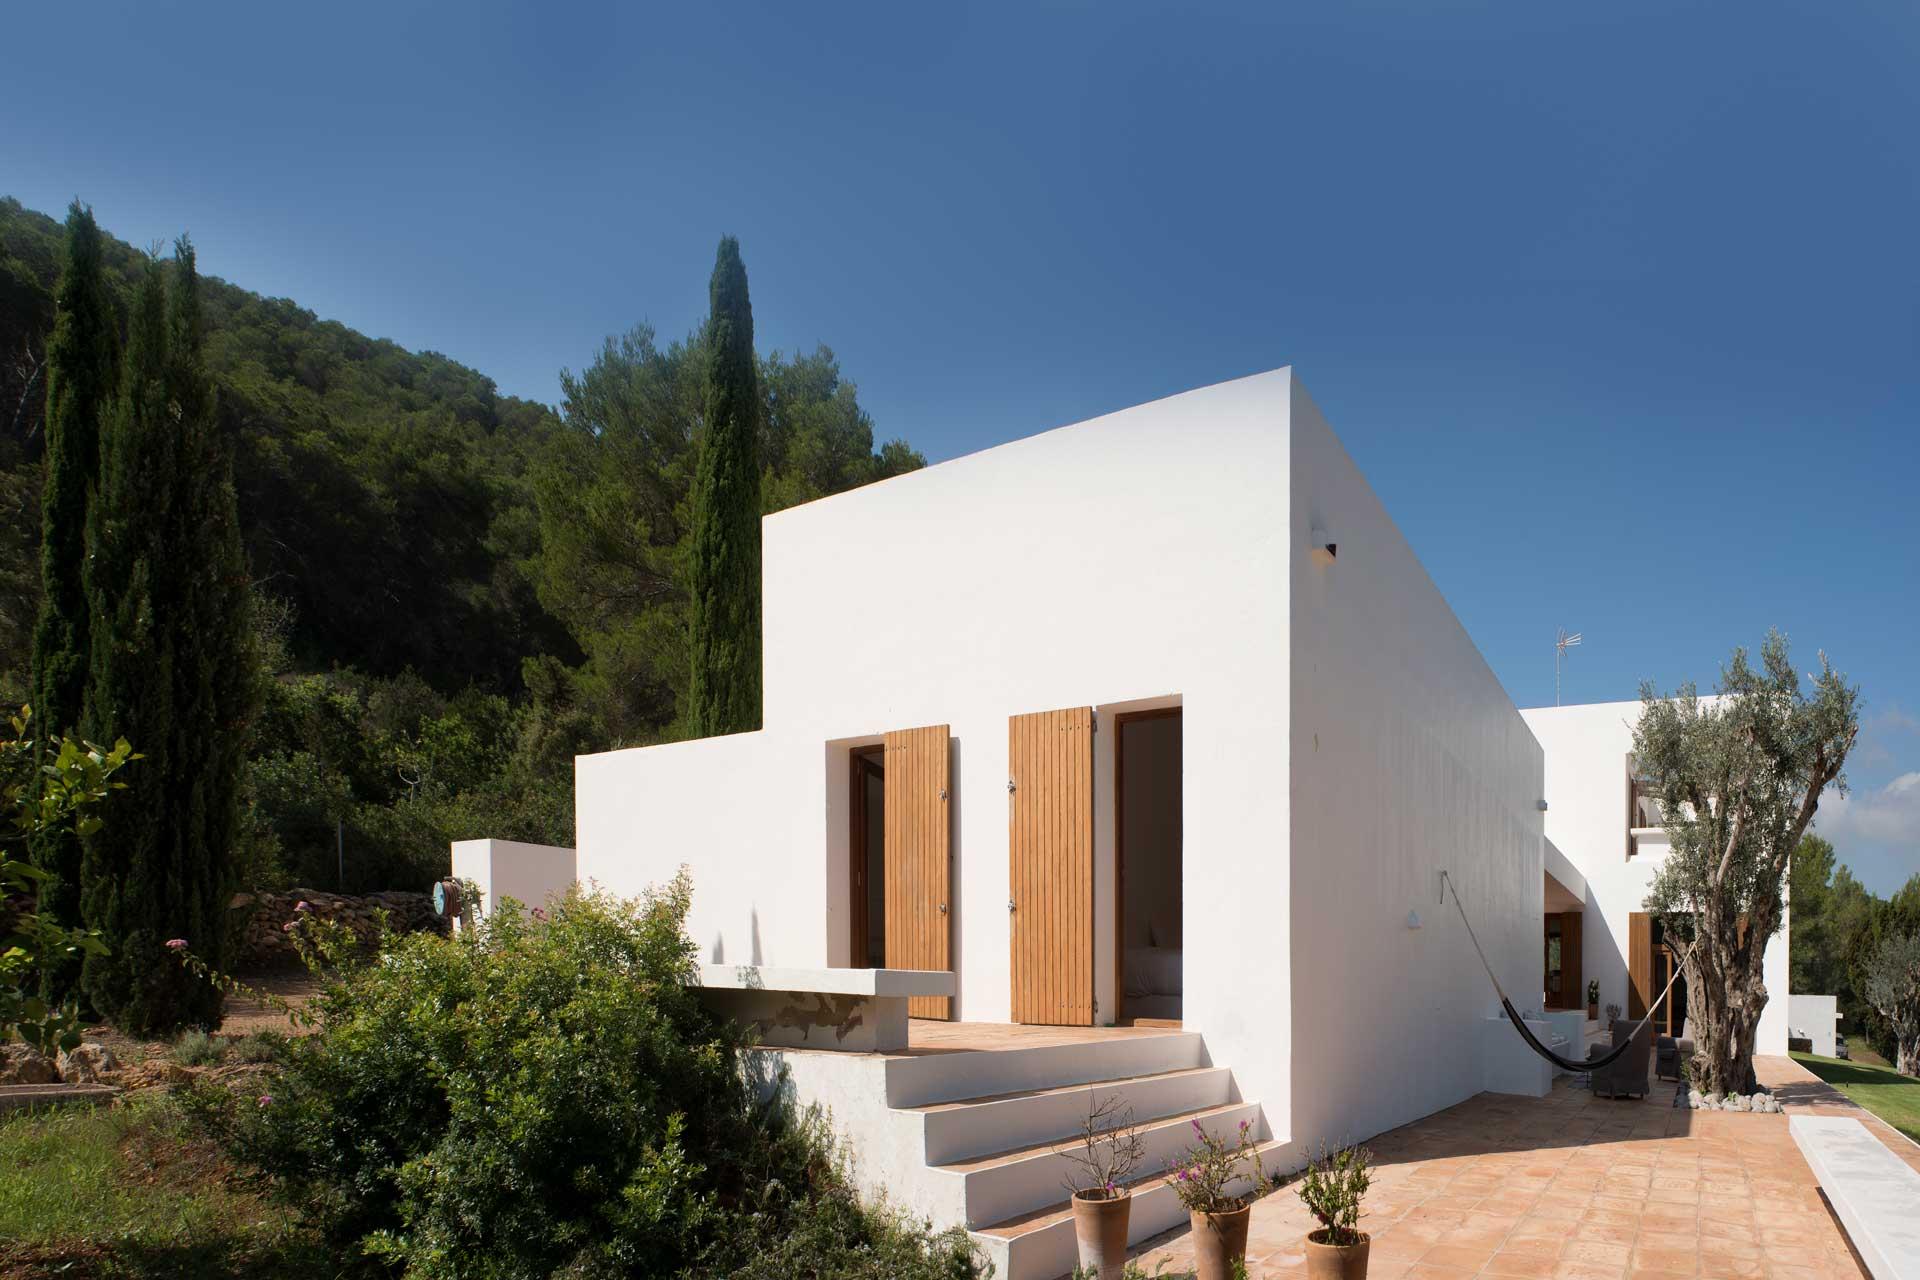 Villa Poeta - Outbuilding with terrace